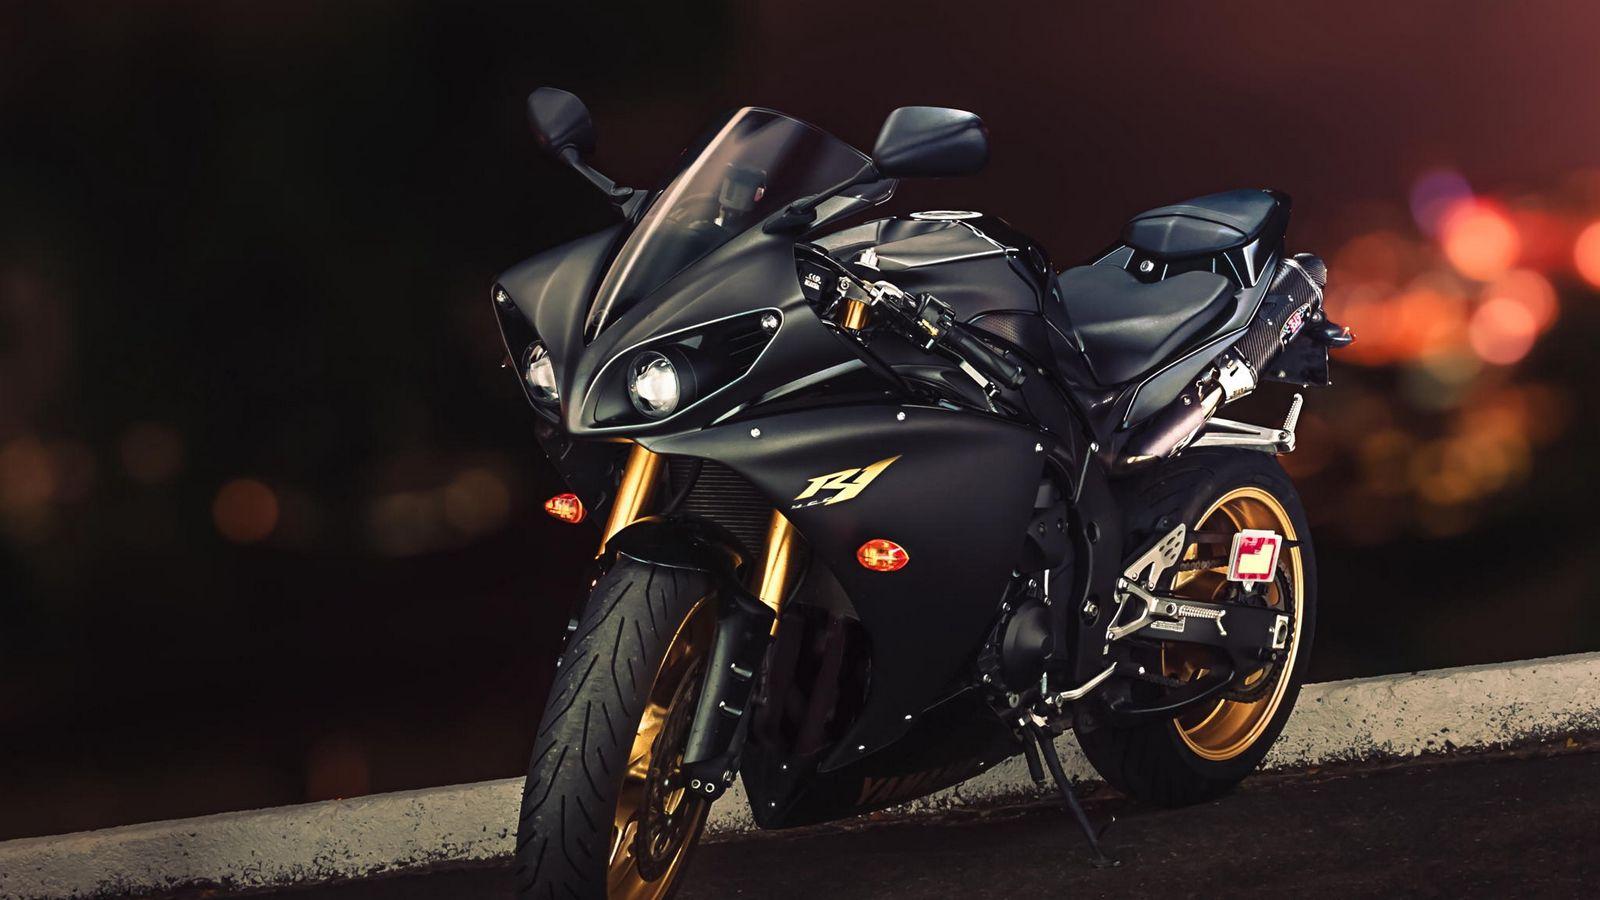 1600x900 Wallpaper yamaha, yzf-r1, sport bike